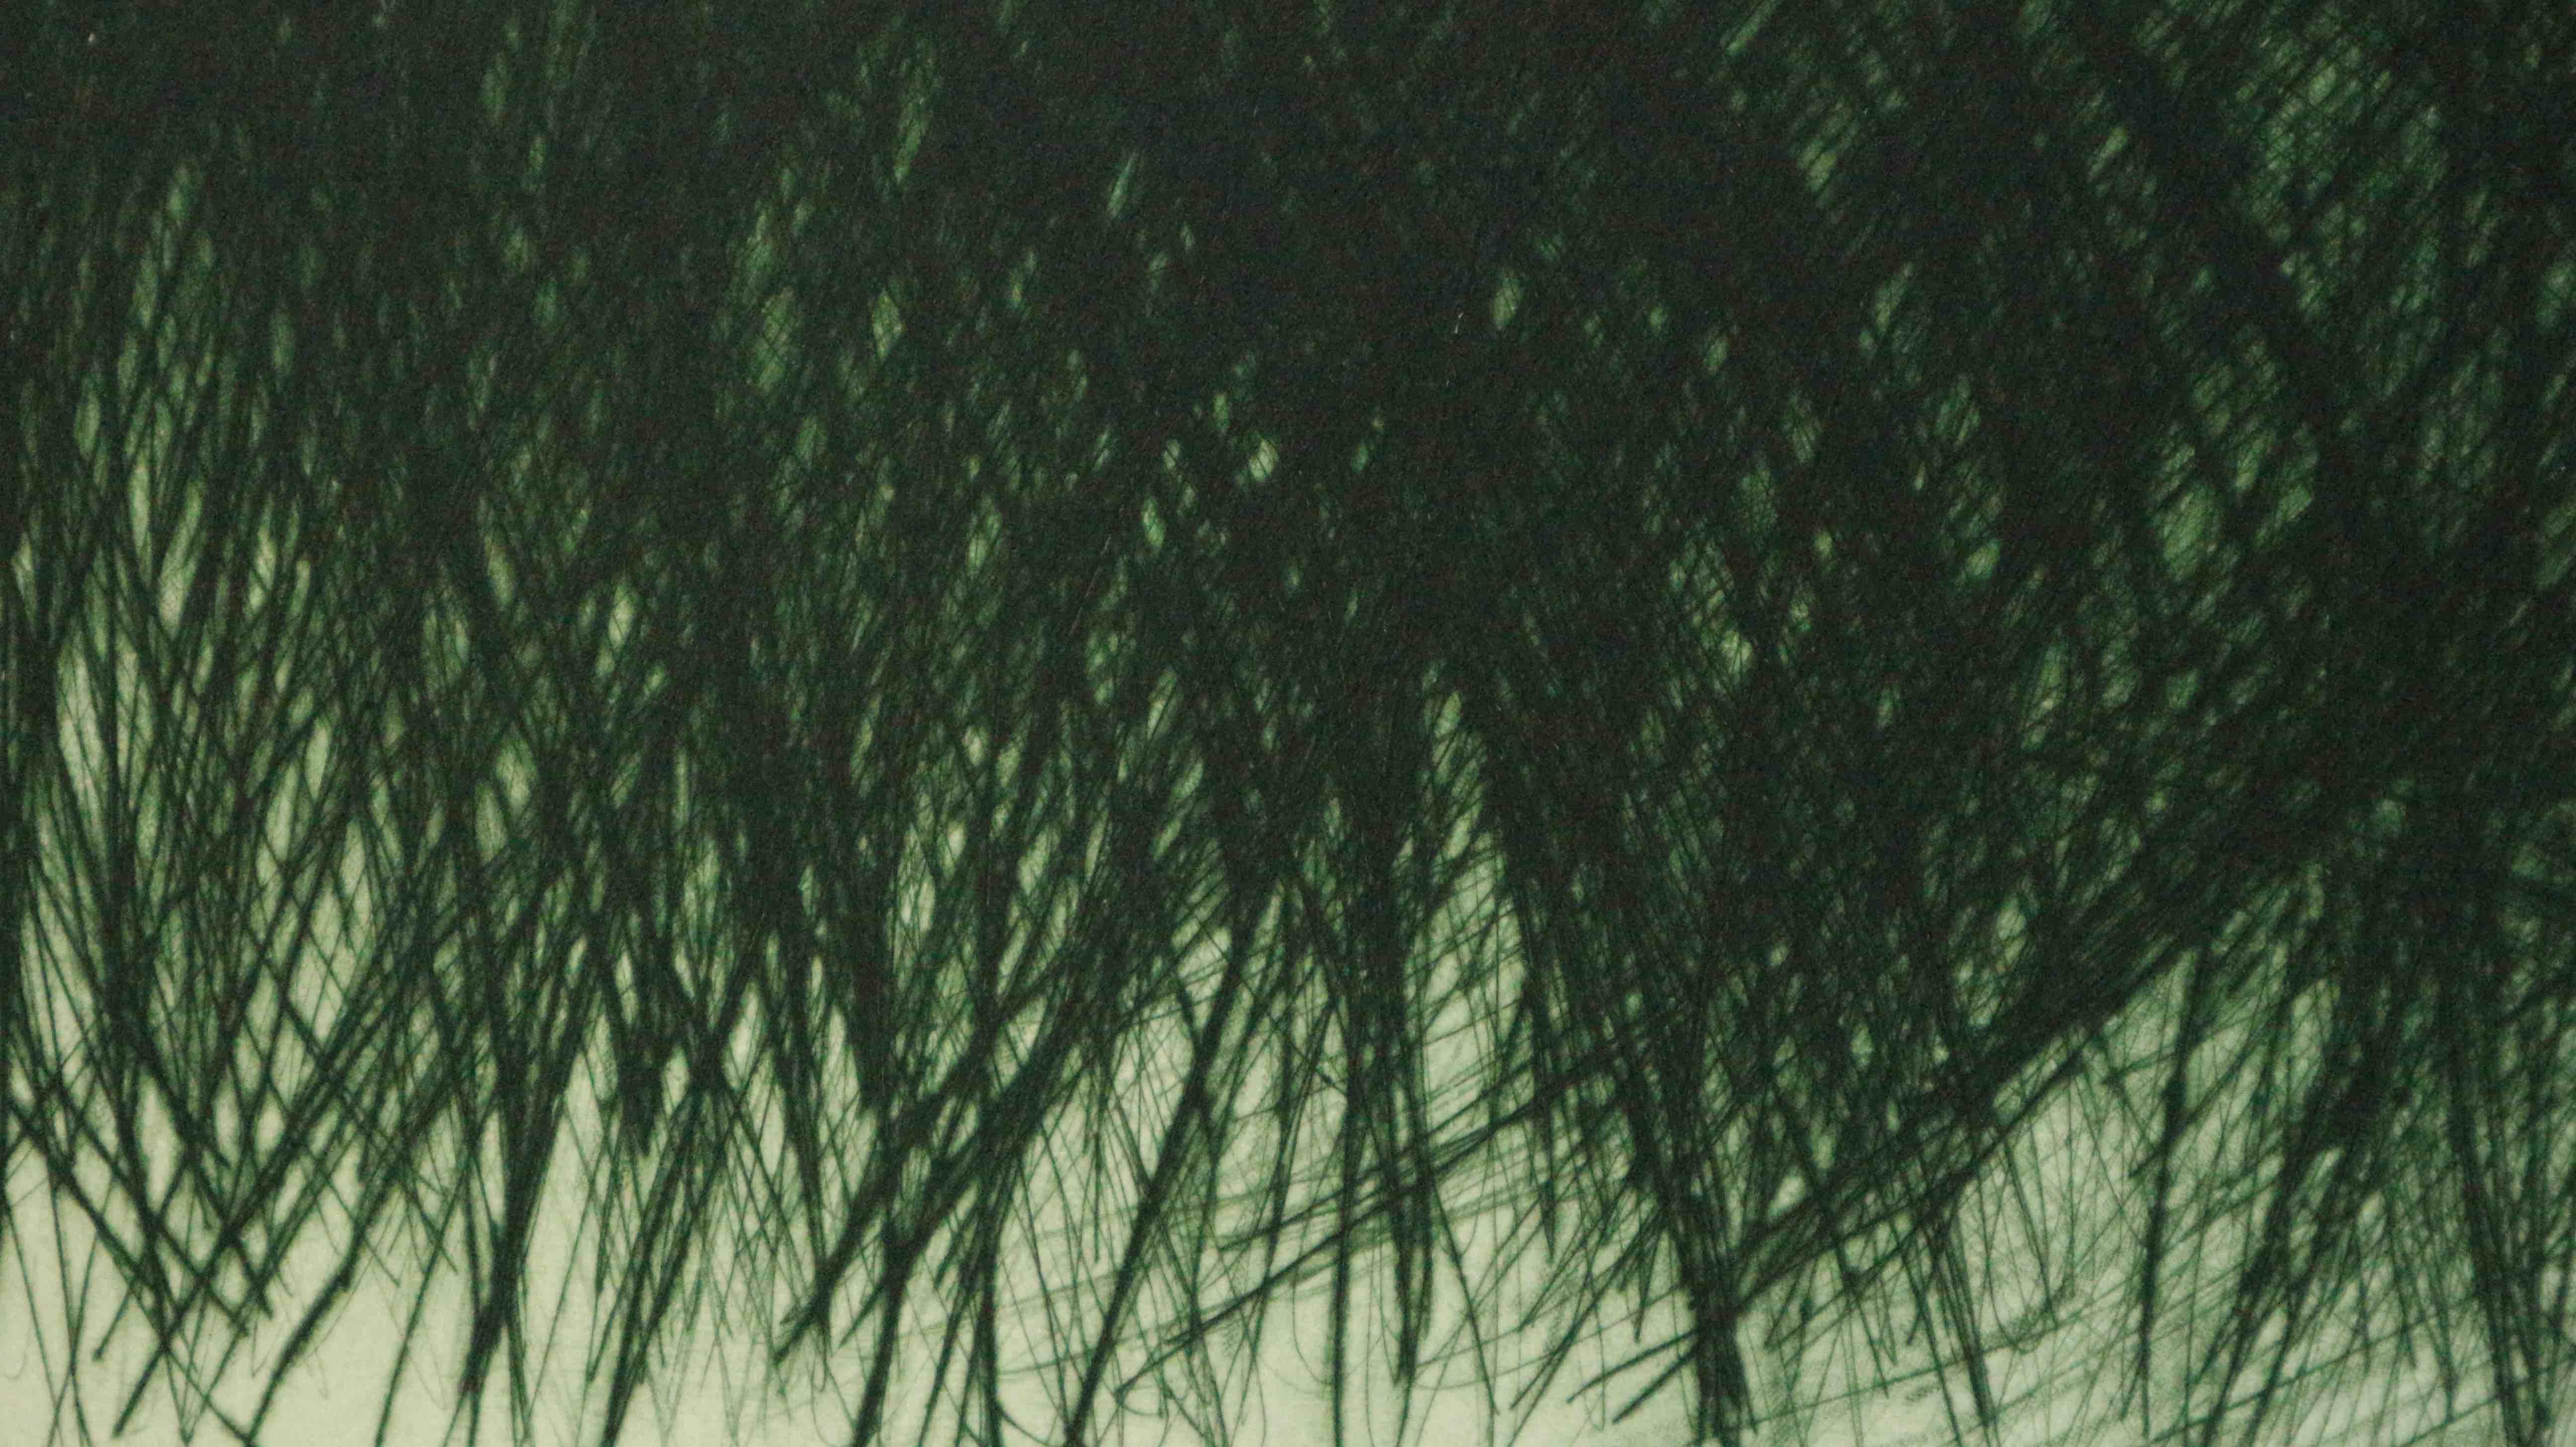 Printemps II (détail) - Pointe sèche, 65x83 cm